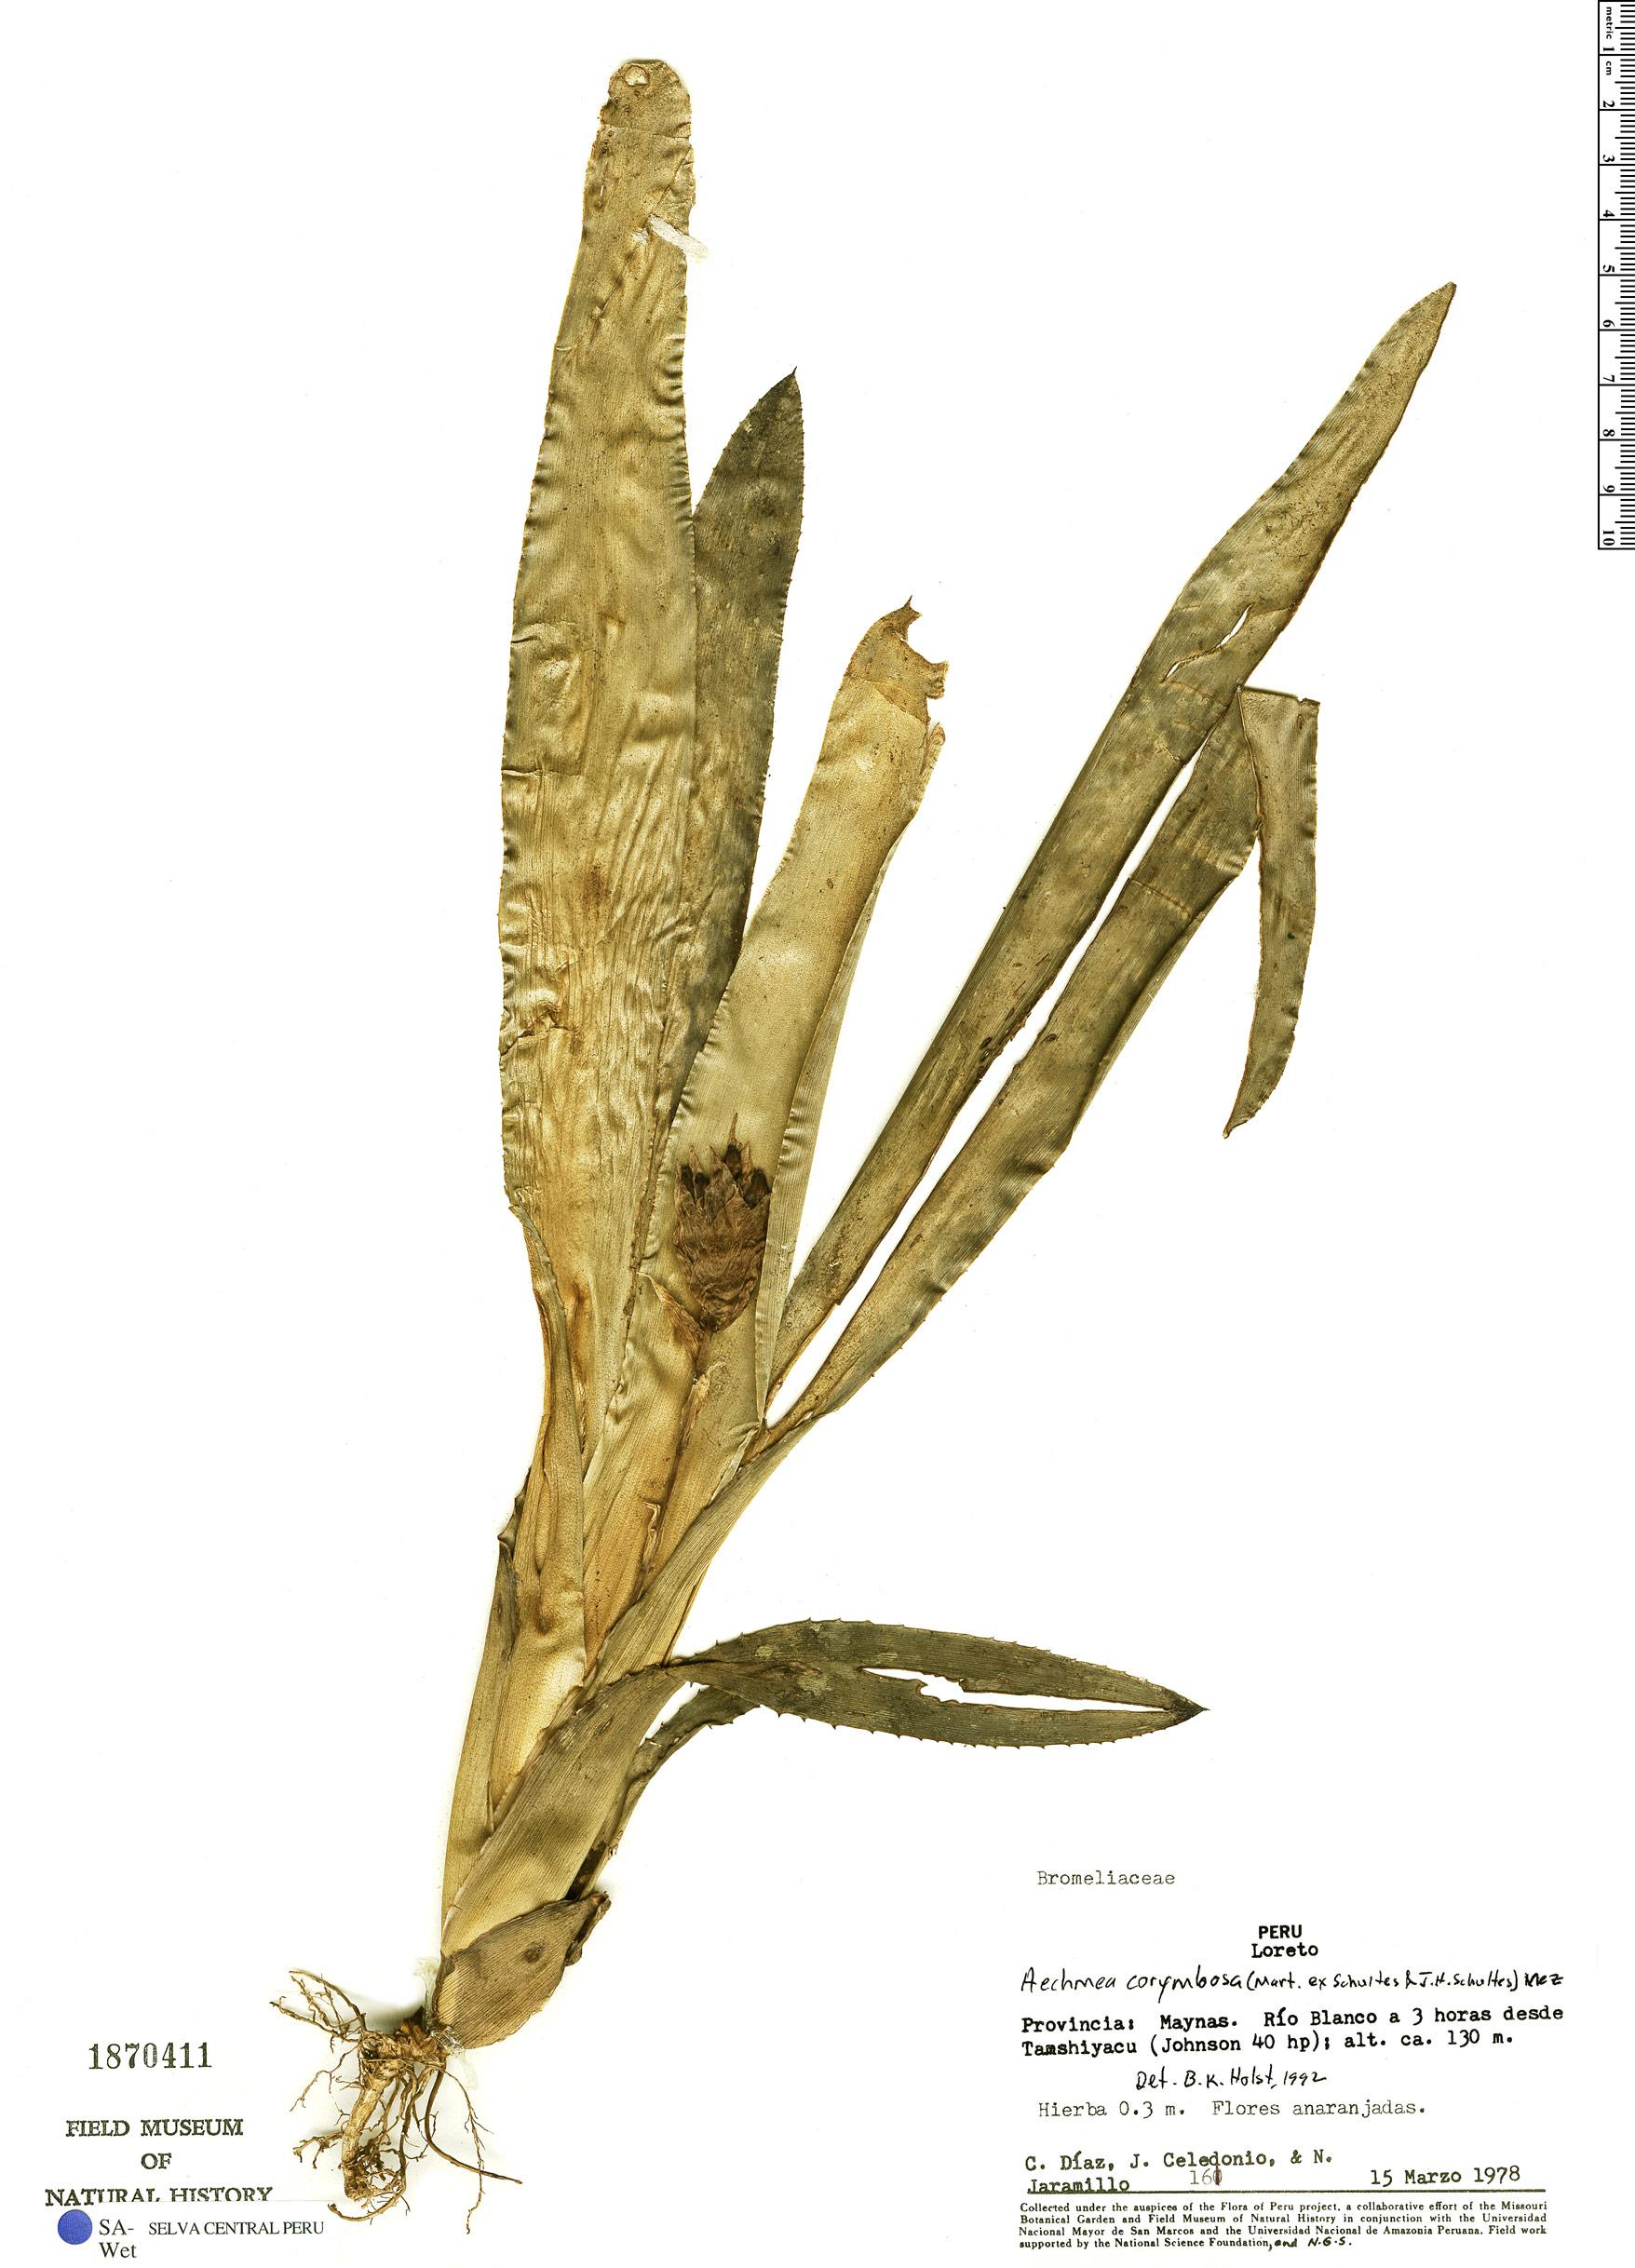 Specimen: Aechmea corymbosa